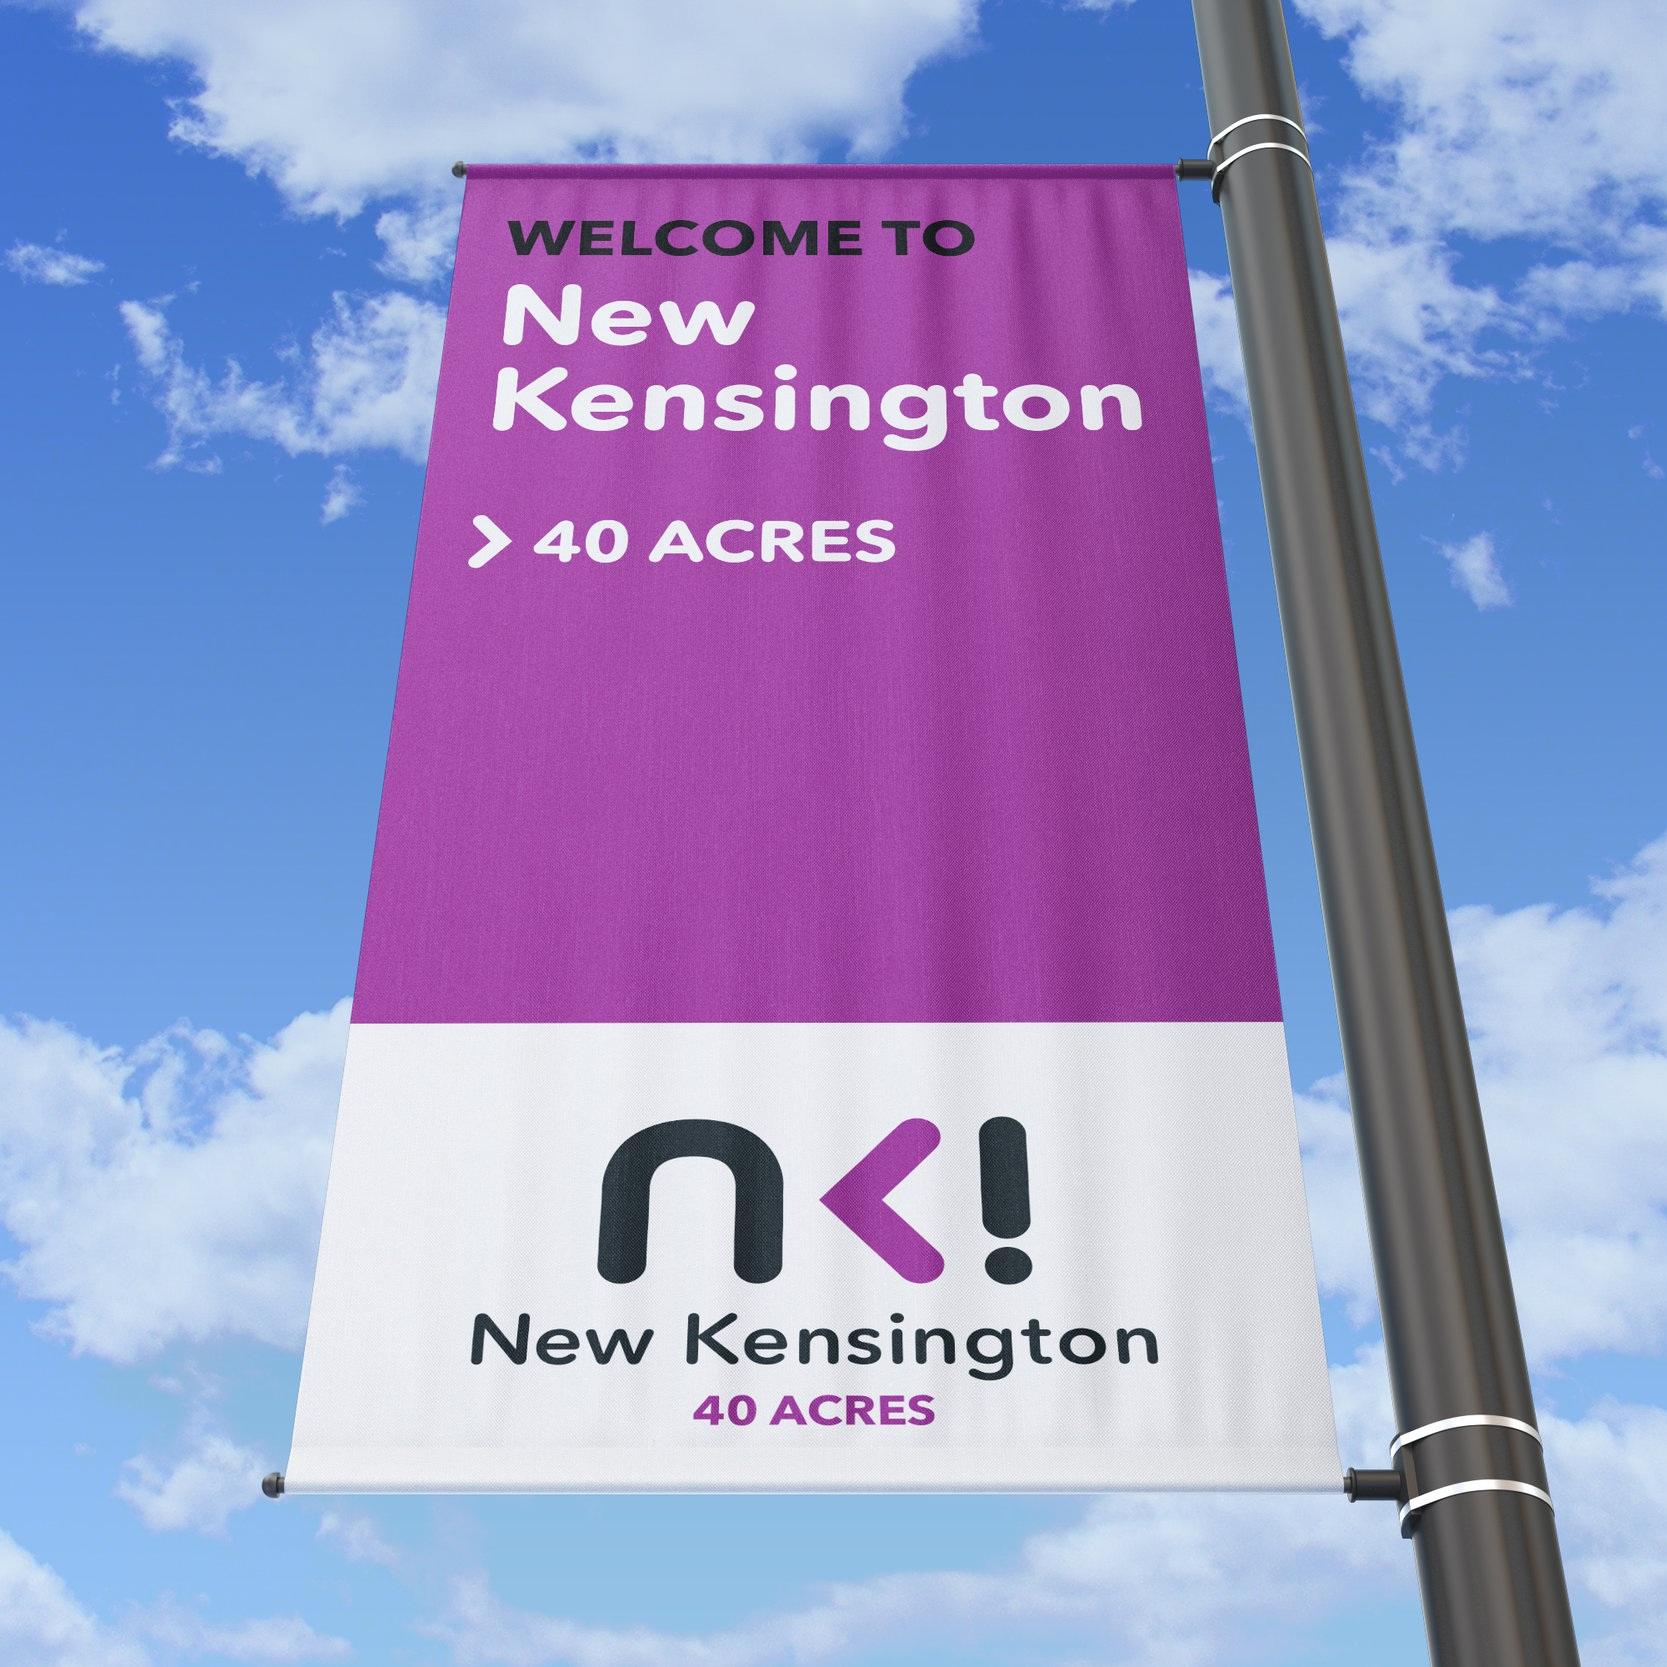 NewKen_Welcome_Poster_Concept1_40Acres.jpg